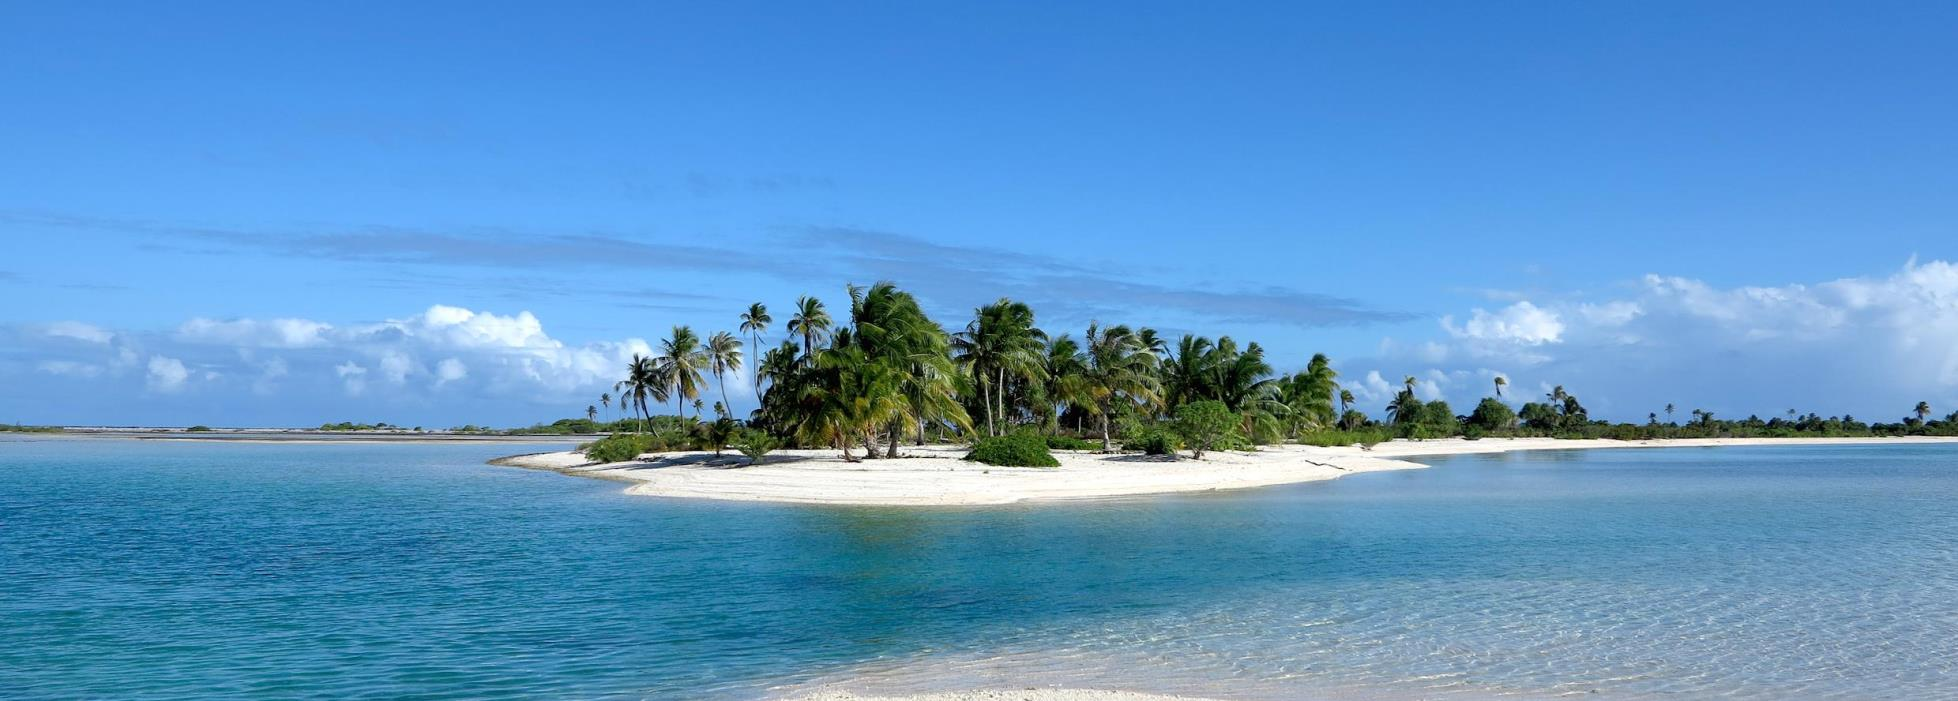 TIKEHAU-TAHITI